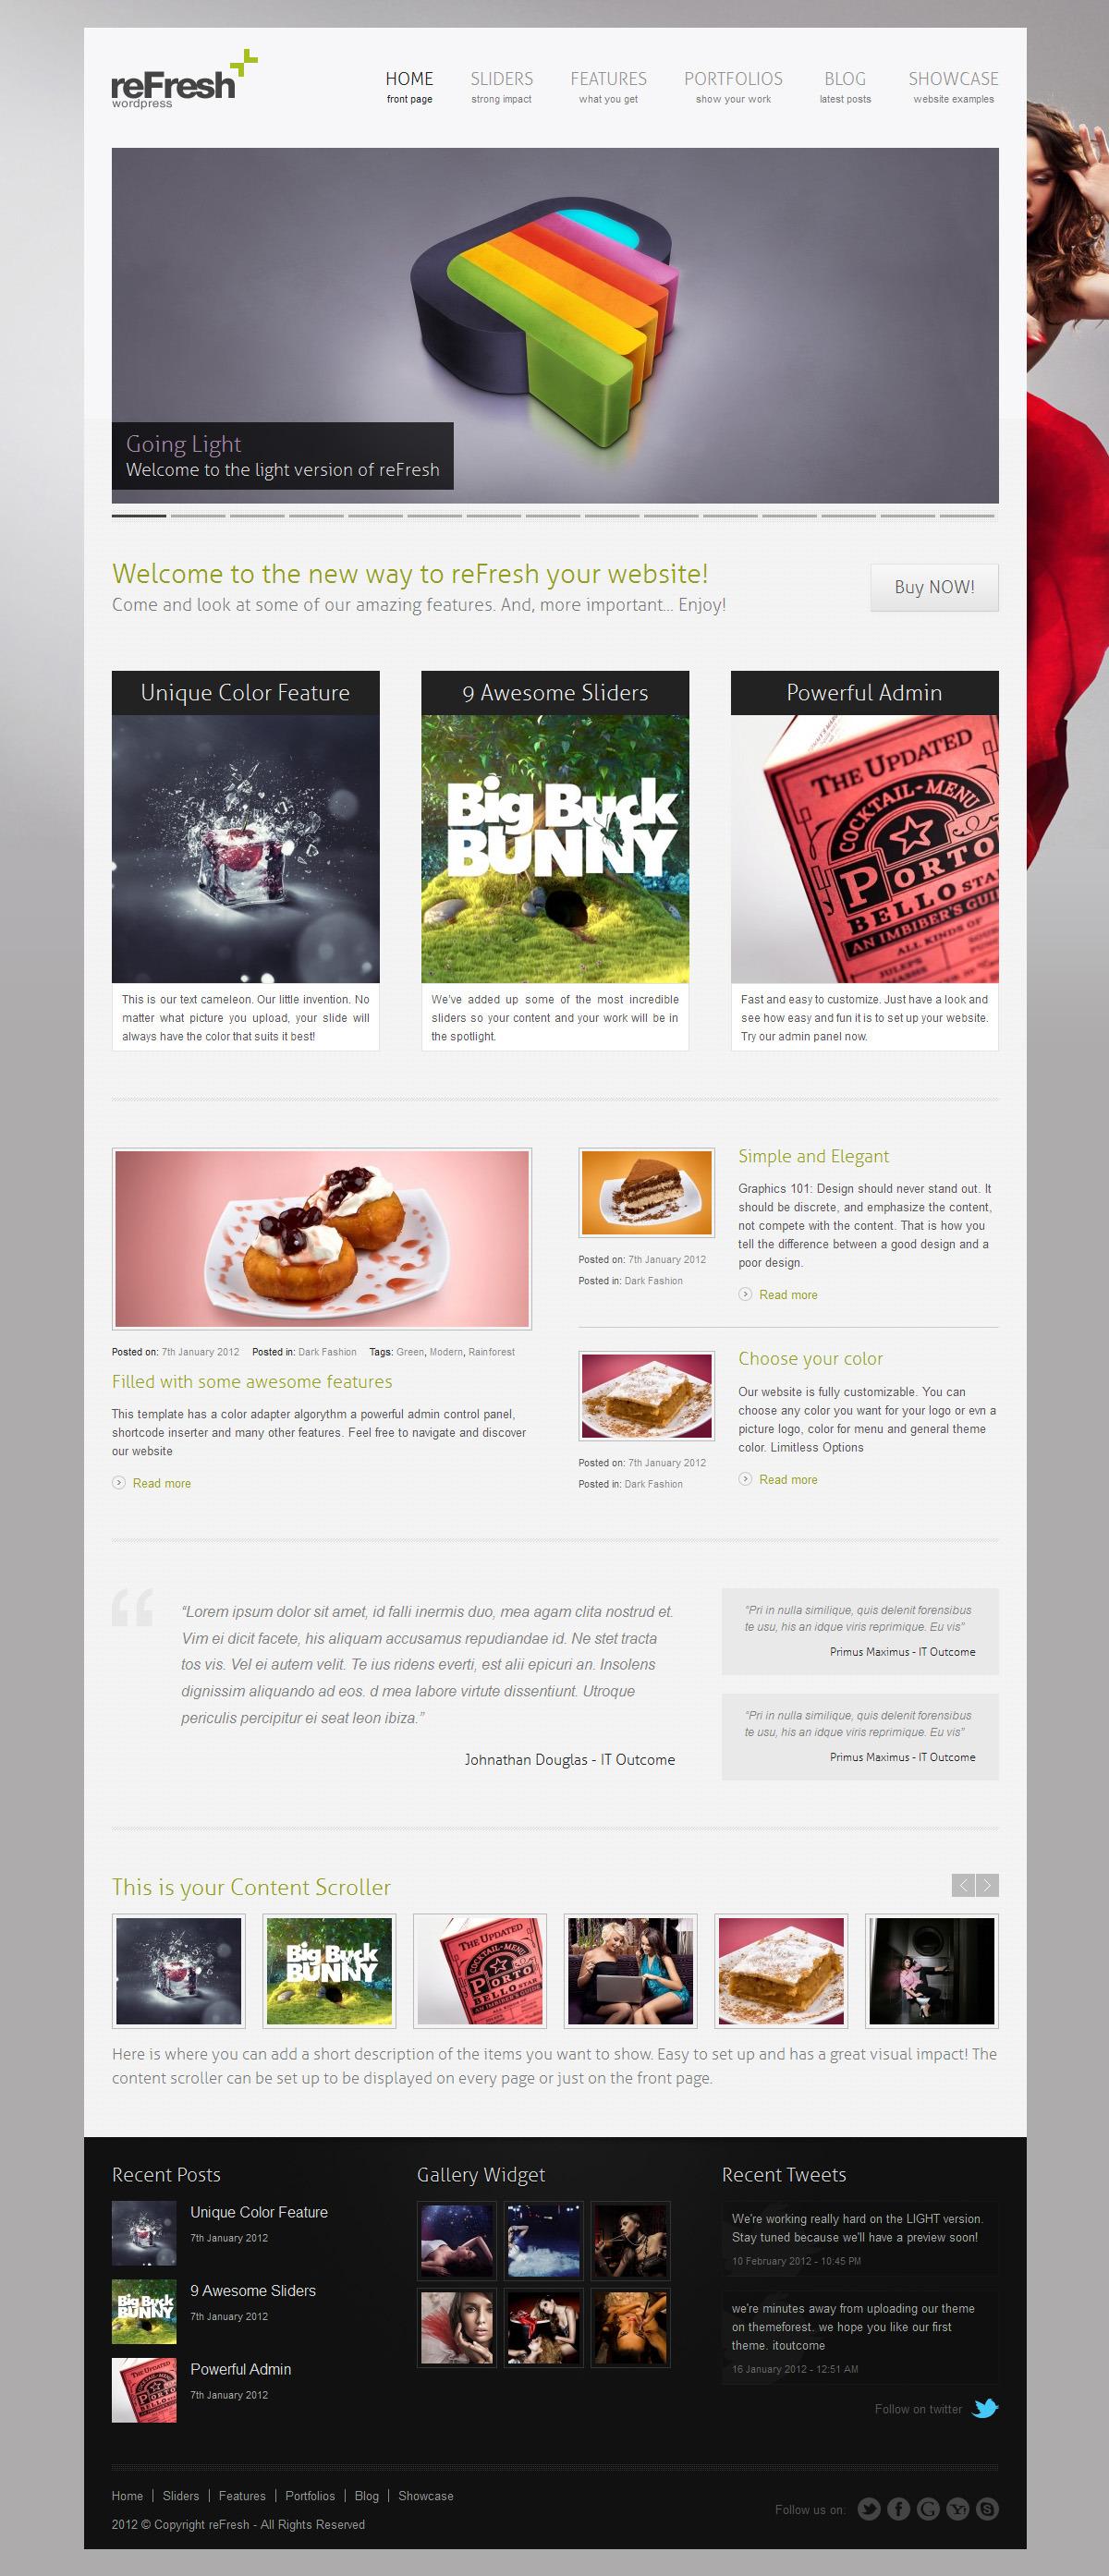 reFresh - Powerful Clean & Elegant WordPress Theme - reFresh Light Version Out Now